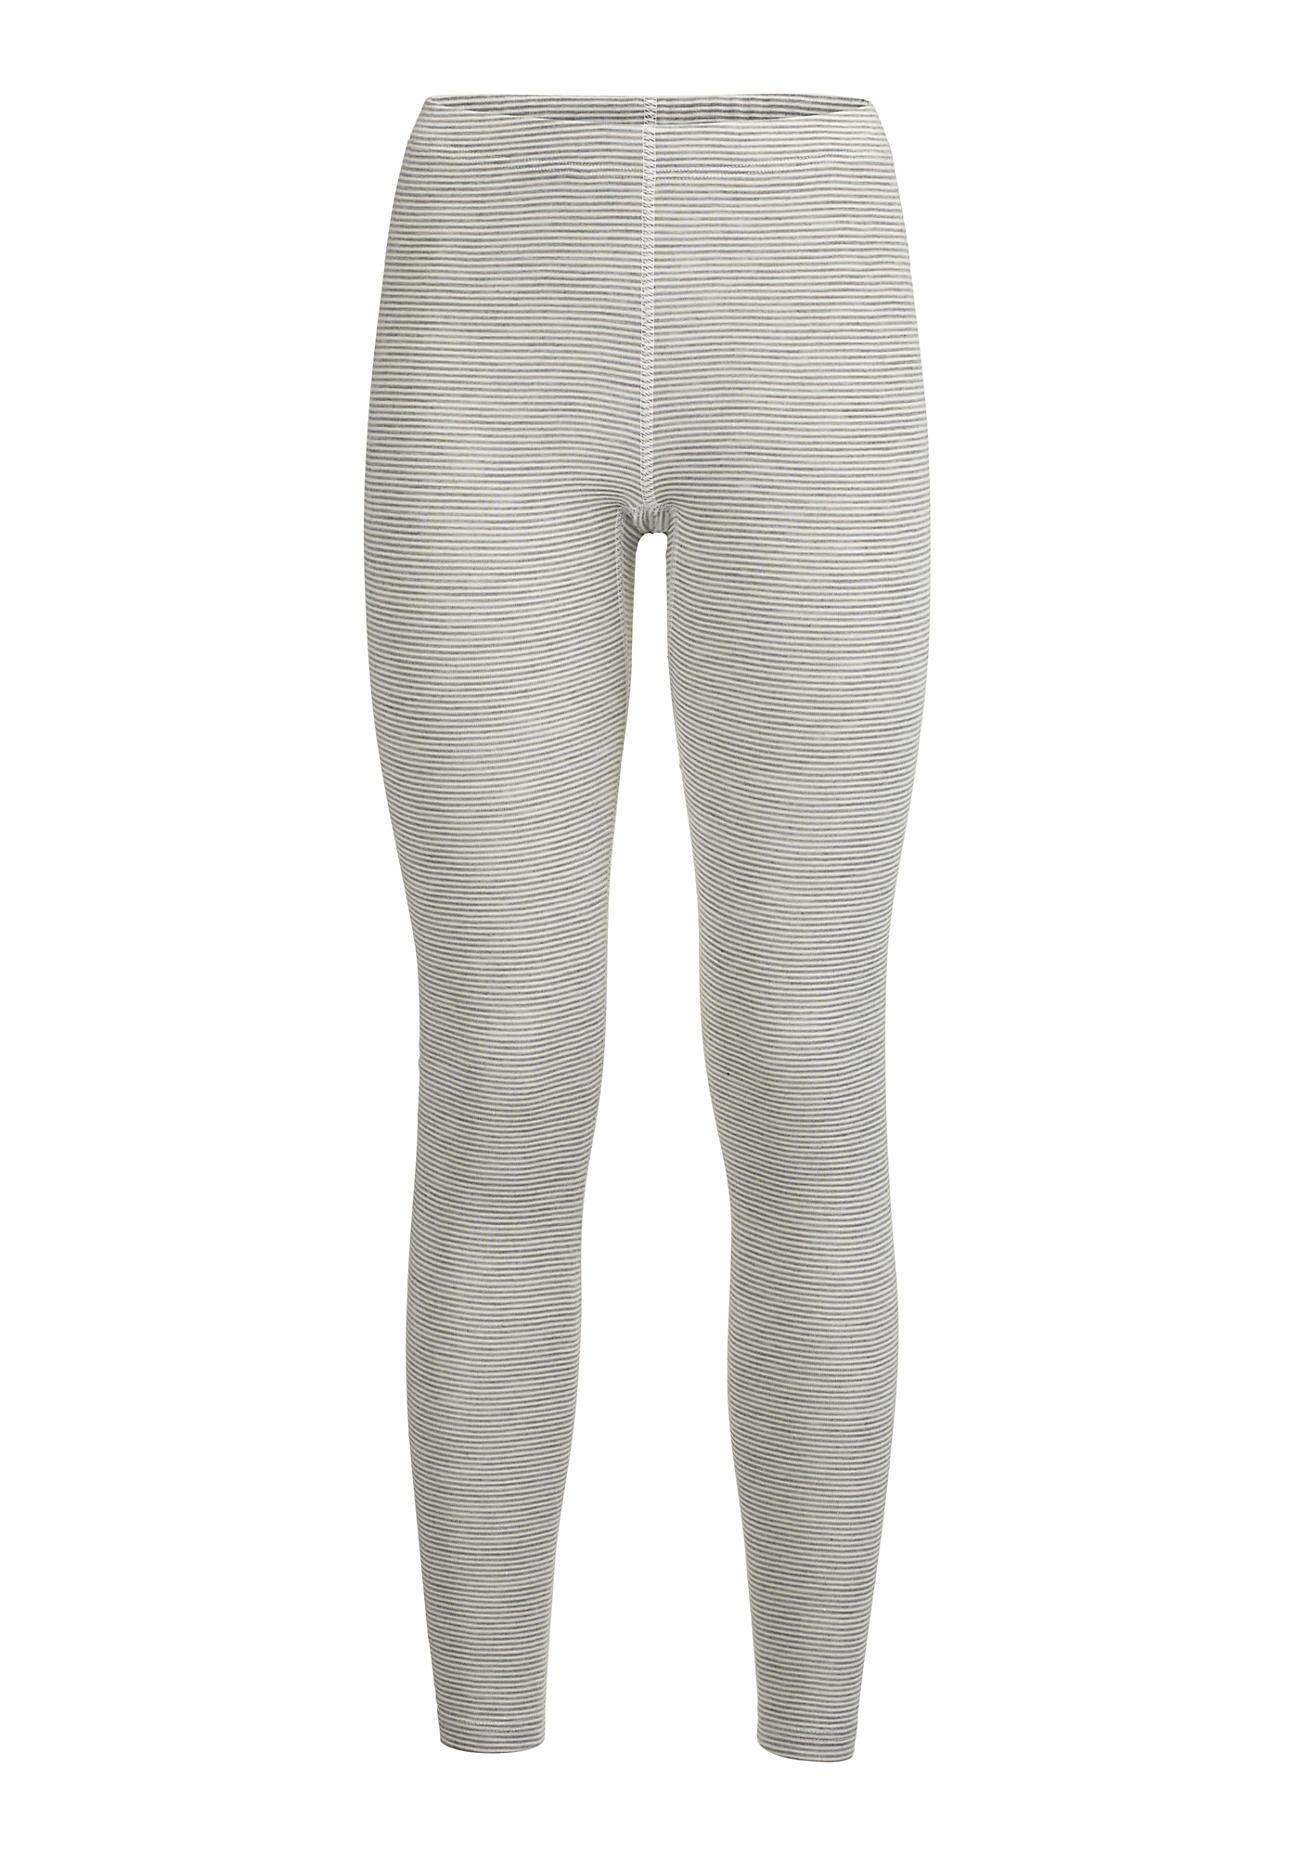 Eastwind Damen Fitnessschuhe Sneaker Farbe schwarz-koralle-weiß Größe 38 NEU